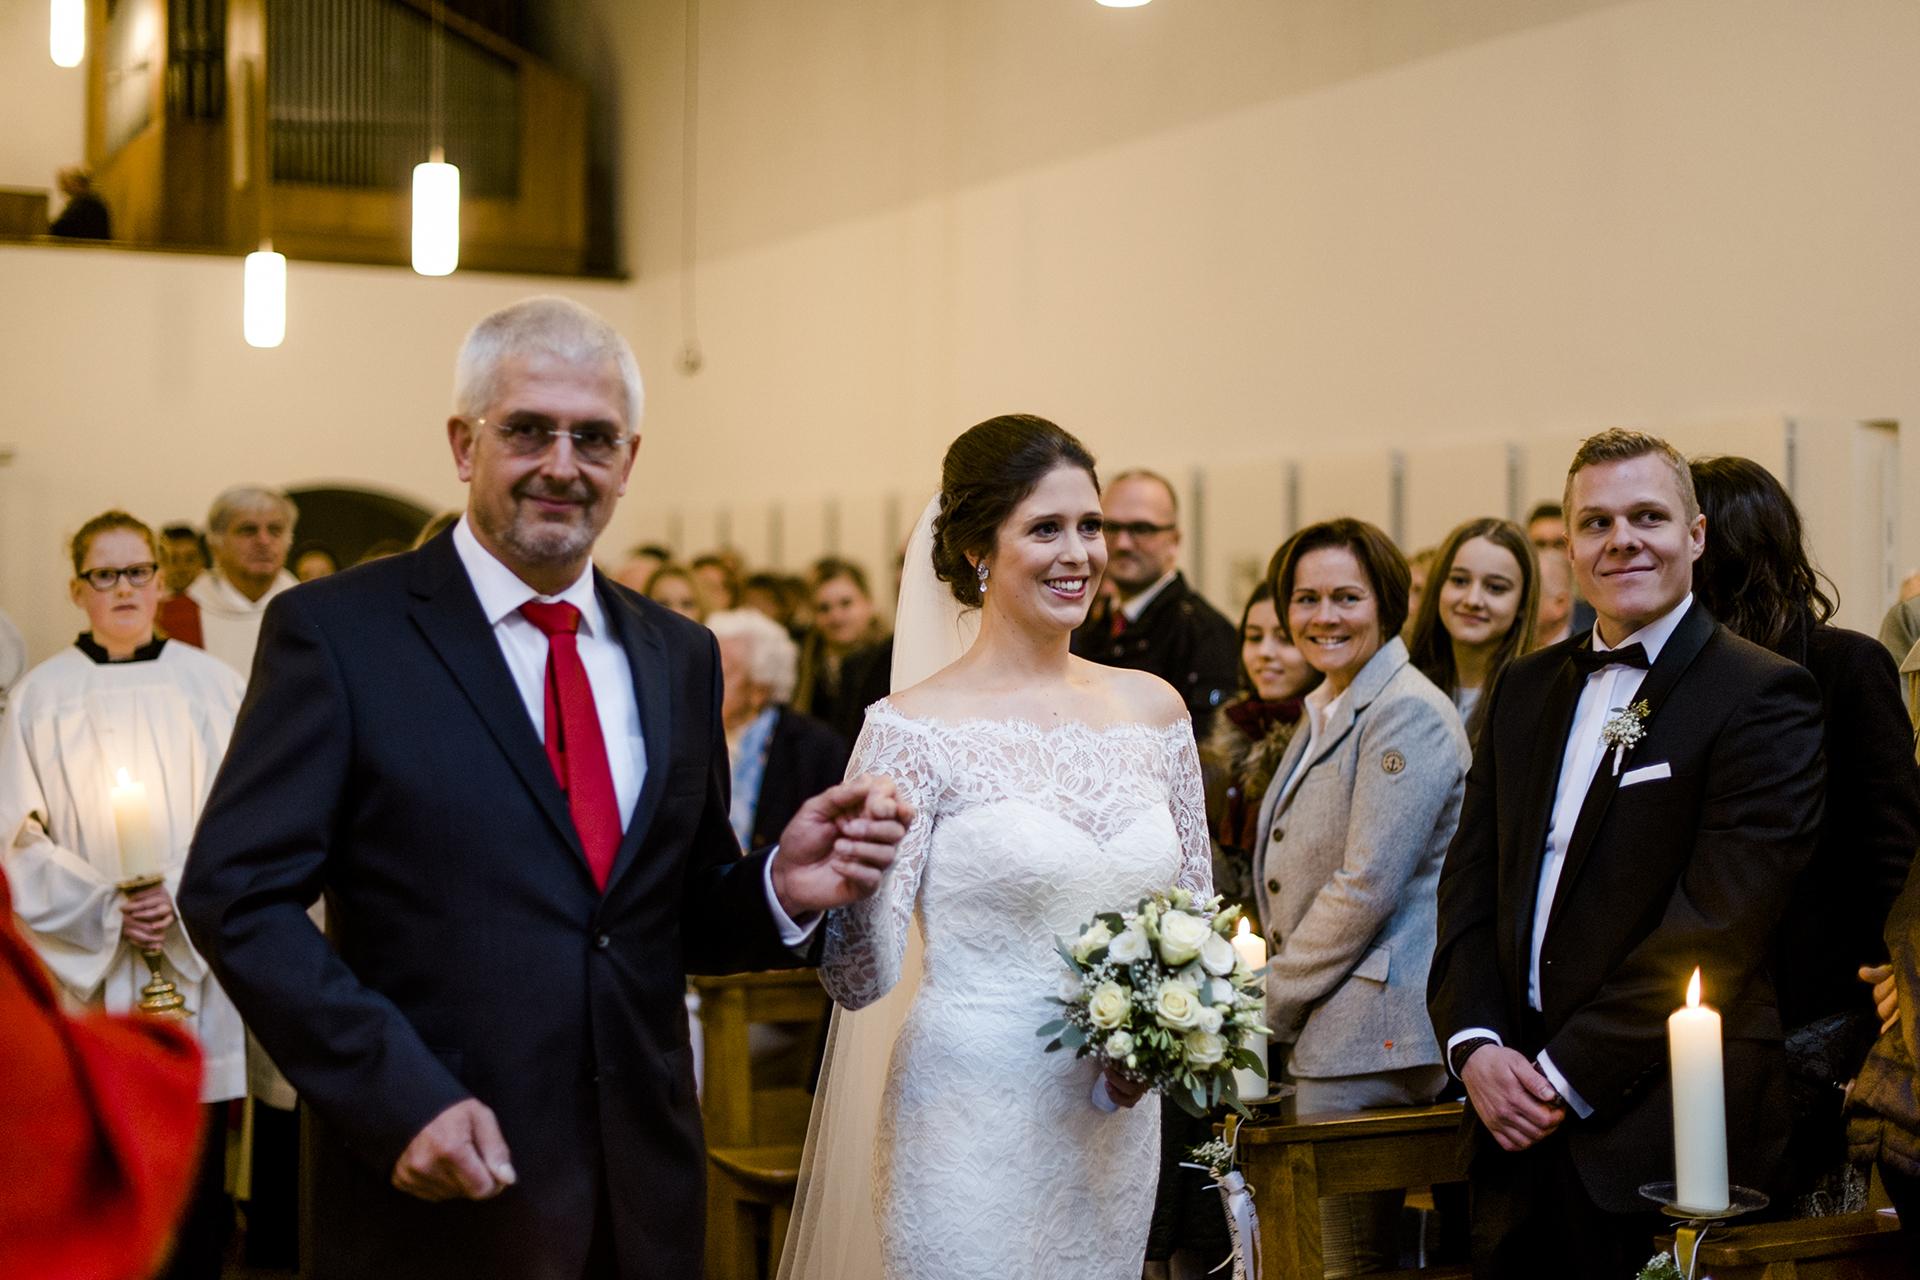 Hochzeitsreportage_J&D_015_Caroline Queda Fotografie